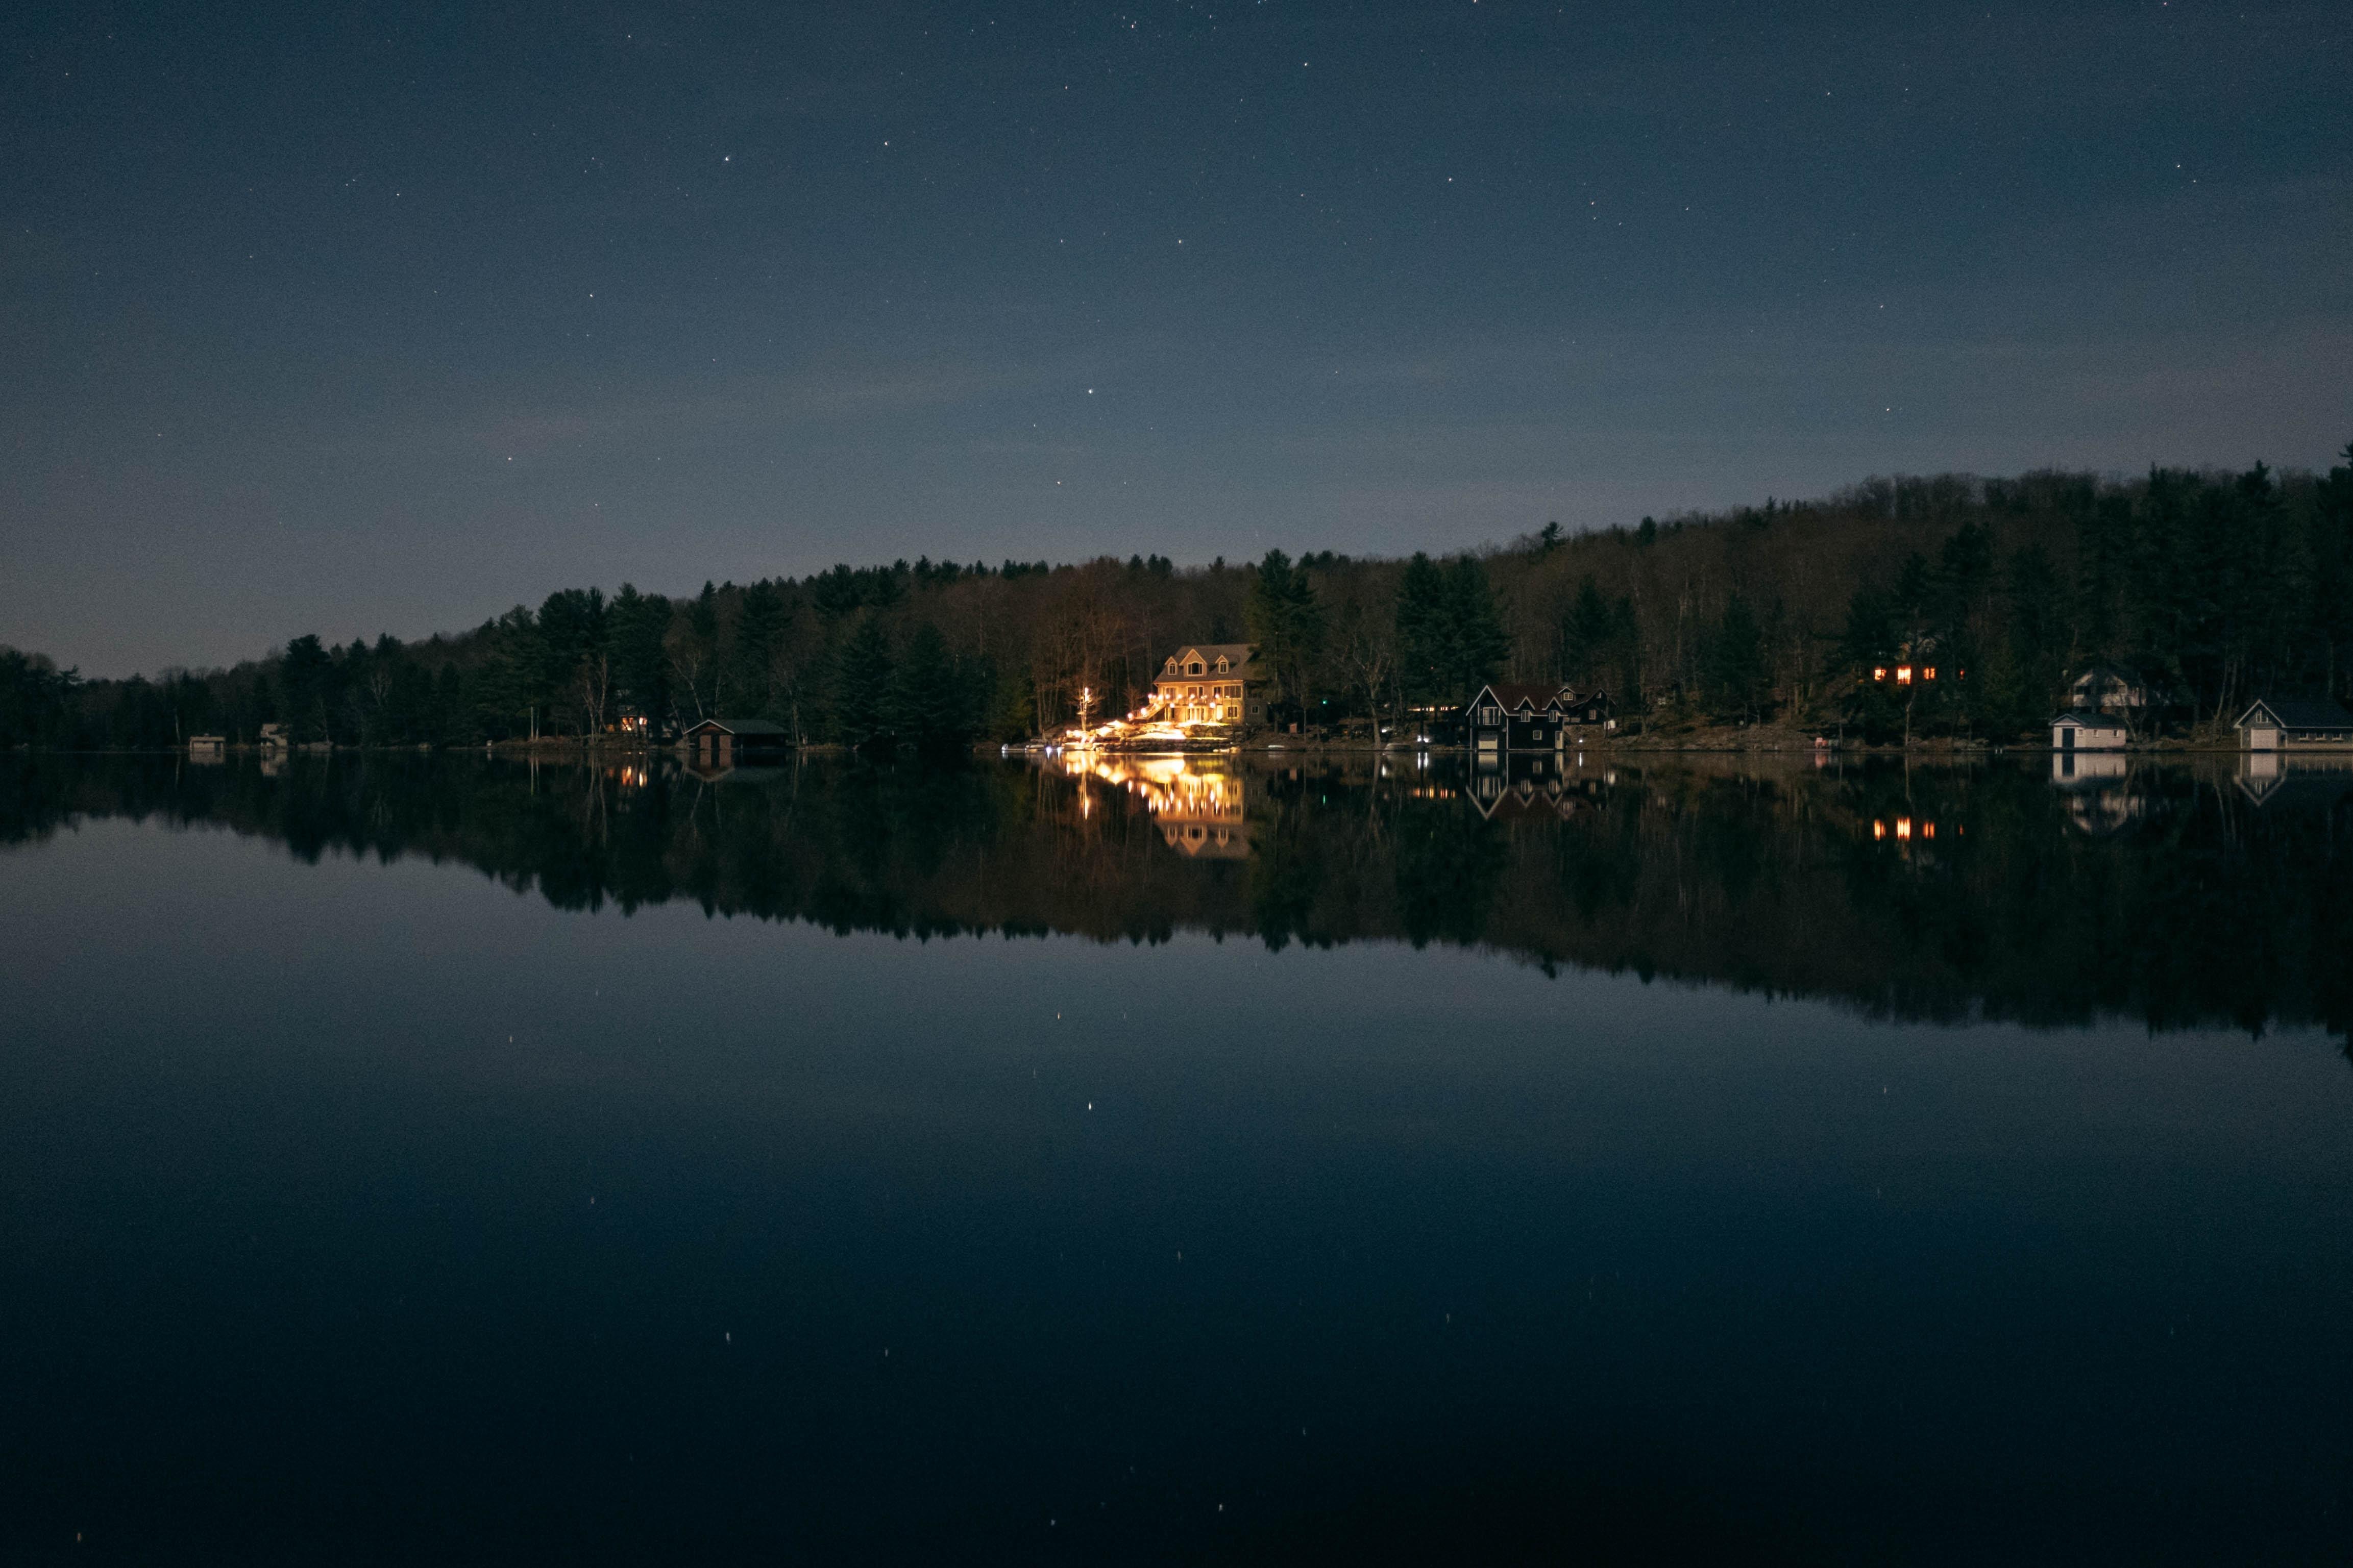 lighted beige house beside shoreline during nighttime